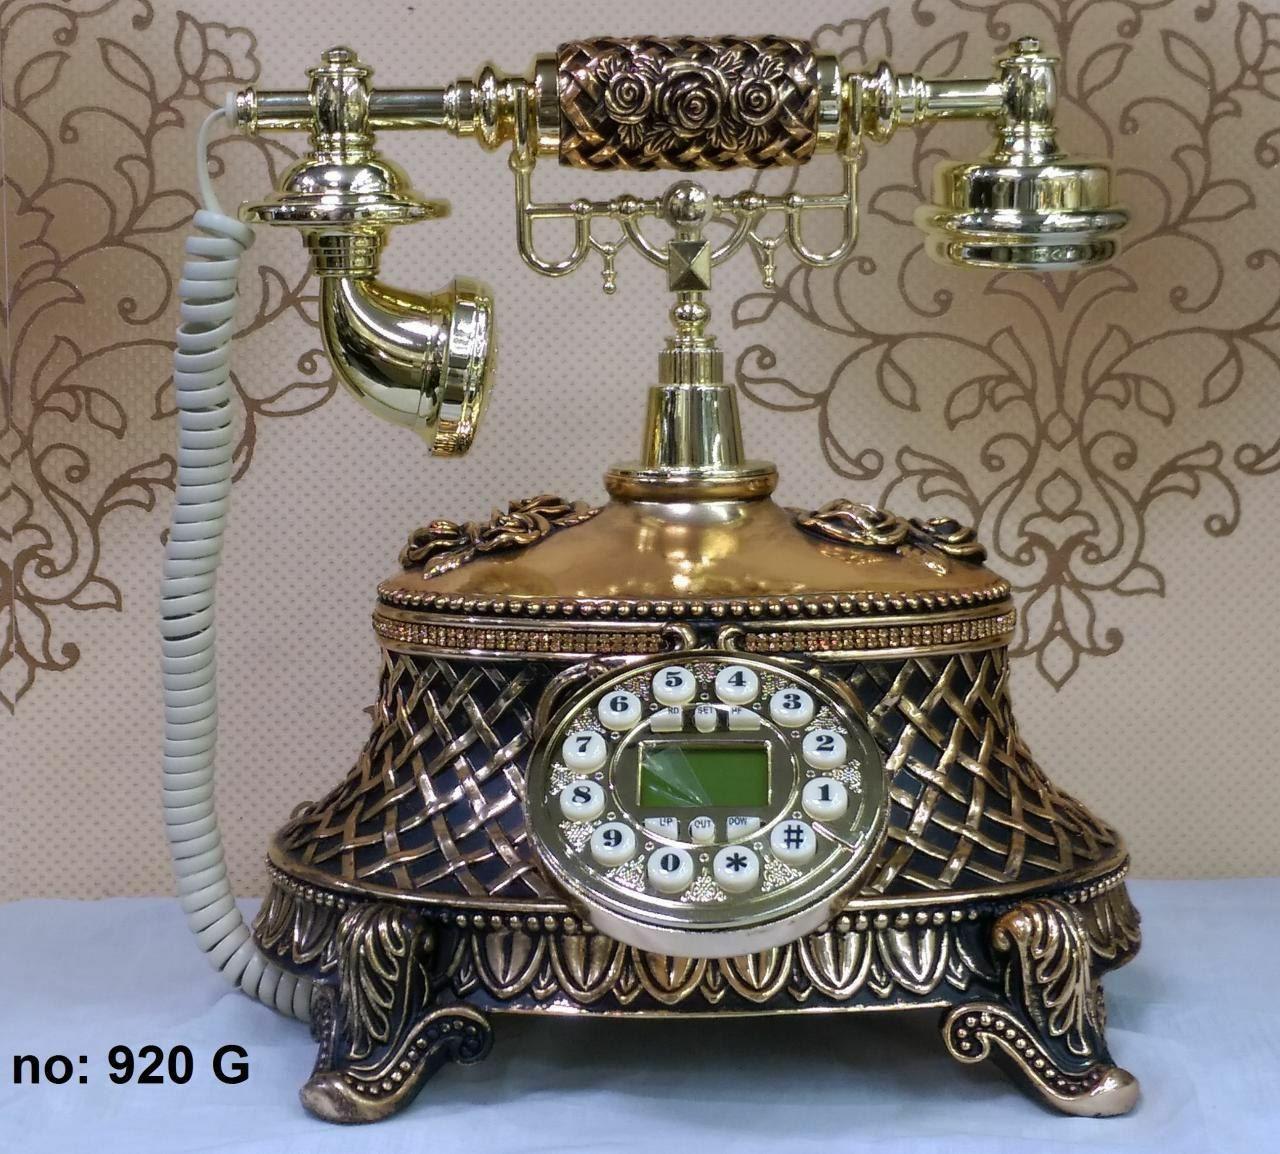 تلفن  920G  آرنوس